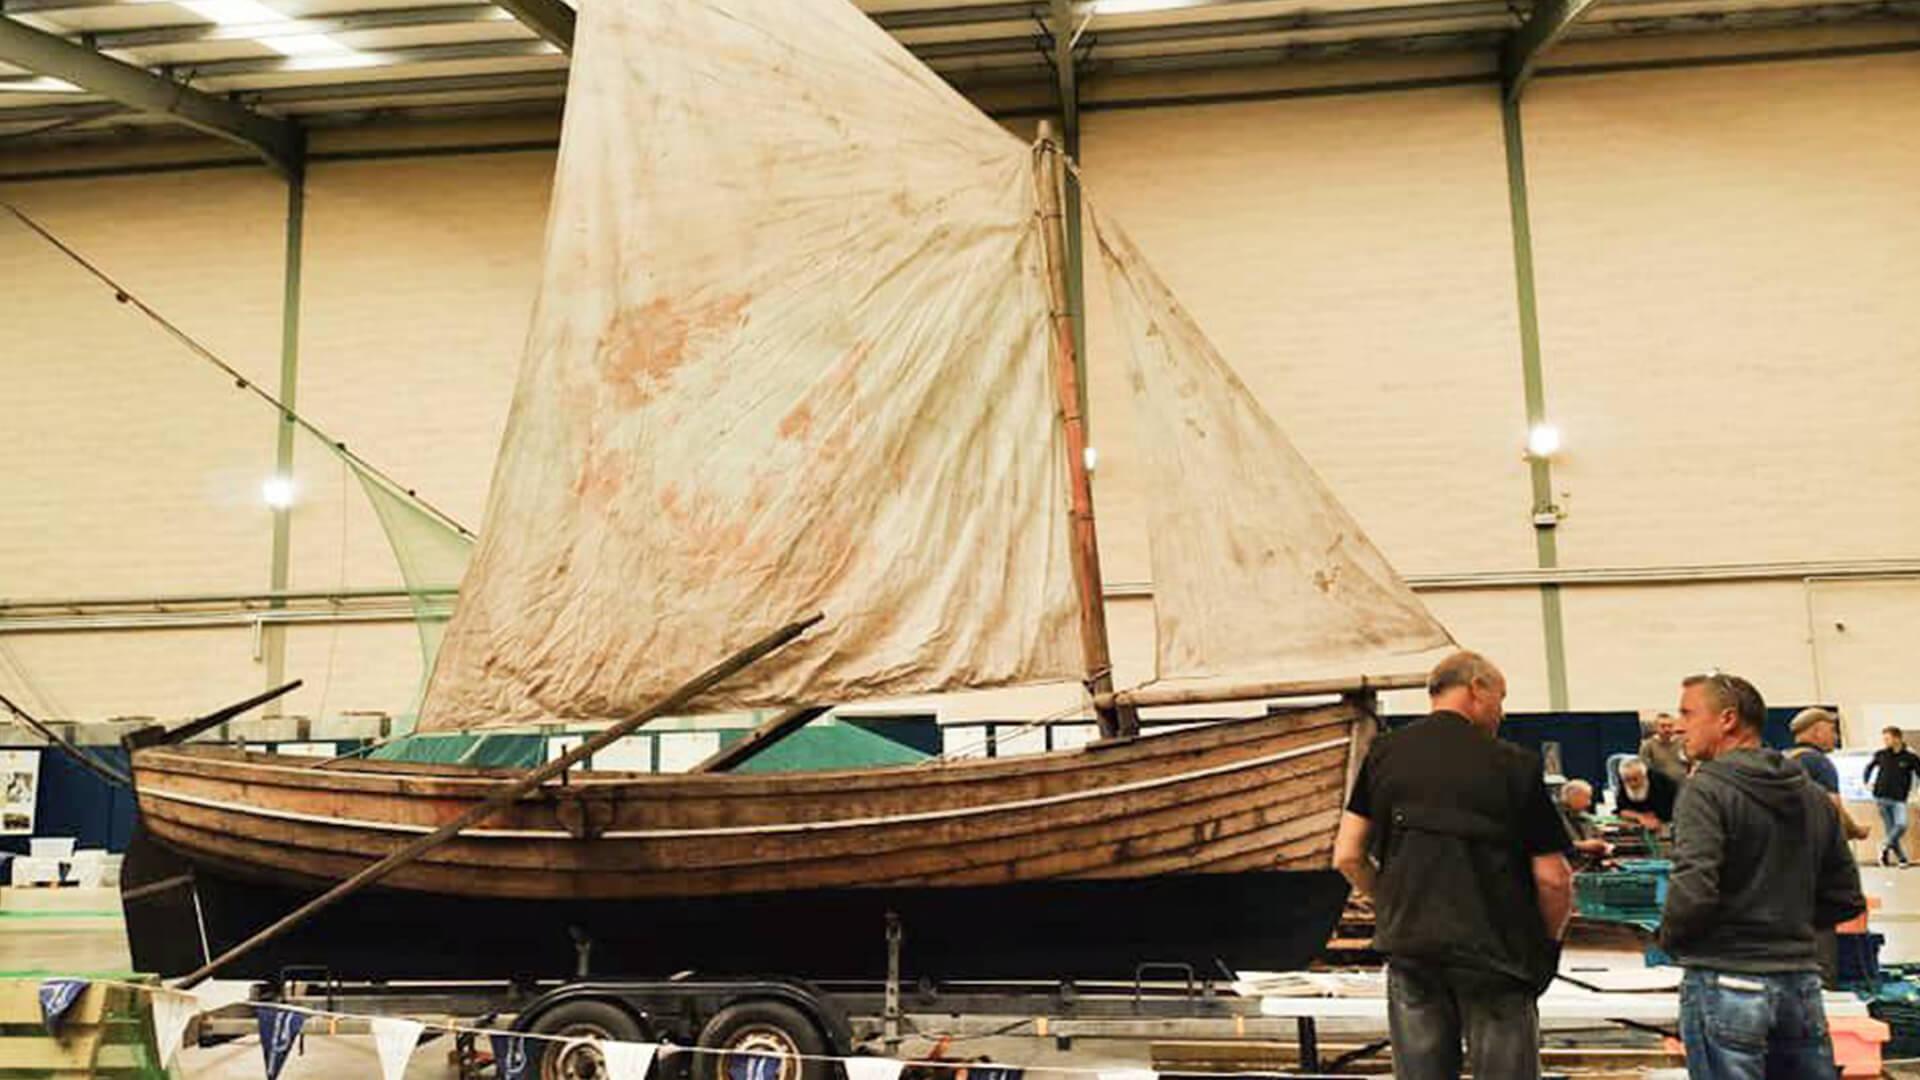 Lough Neagh Boats